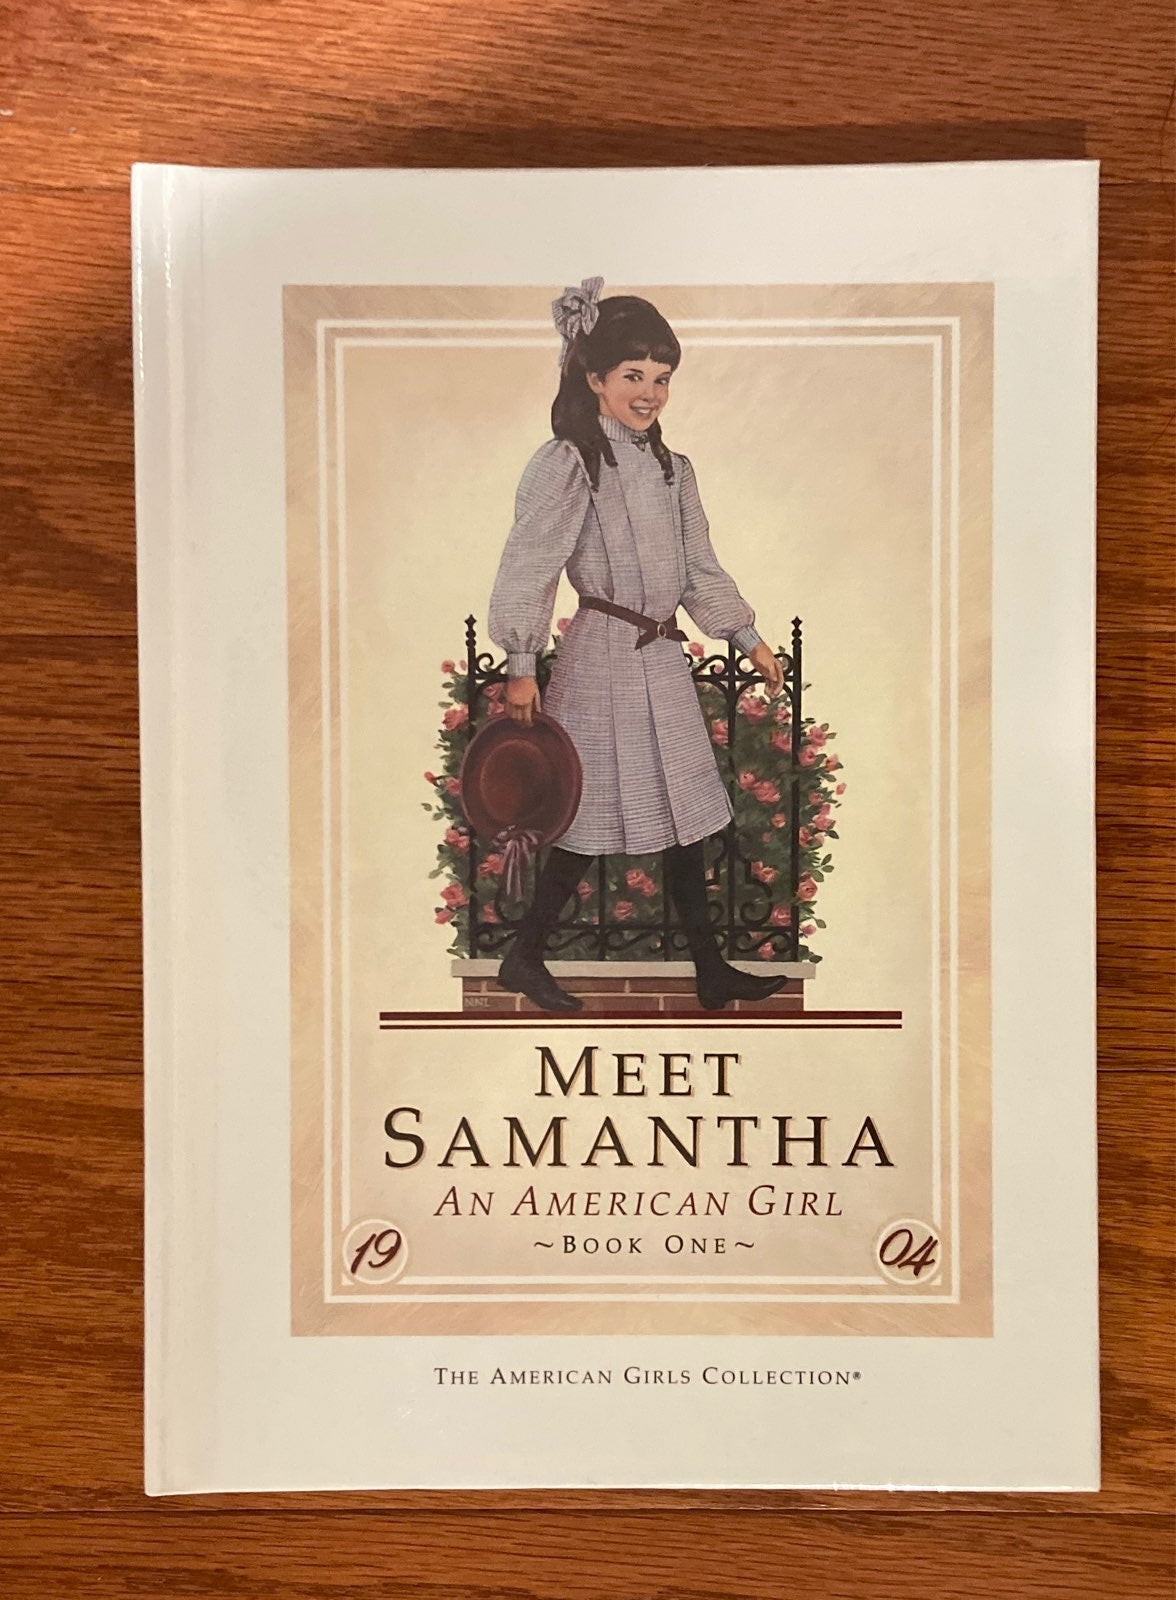 American Girl - Meet Samantha - Book One